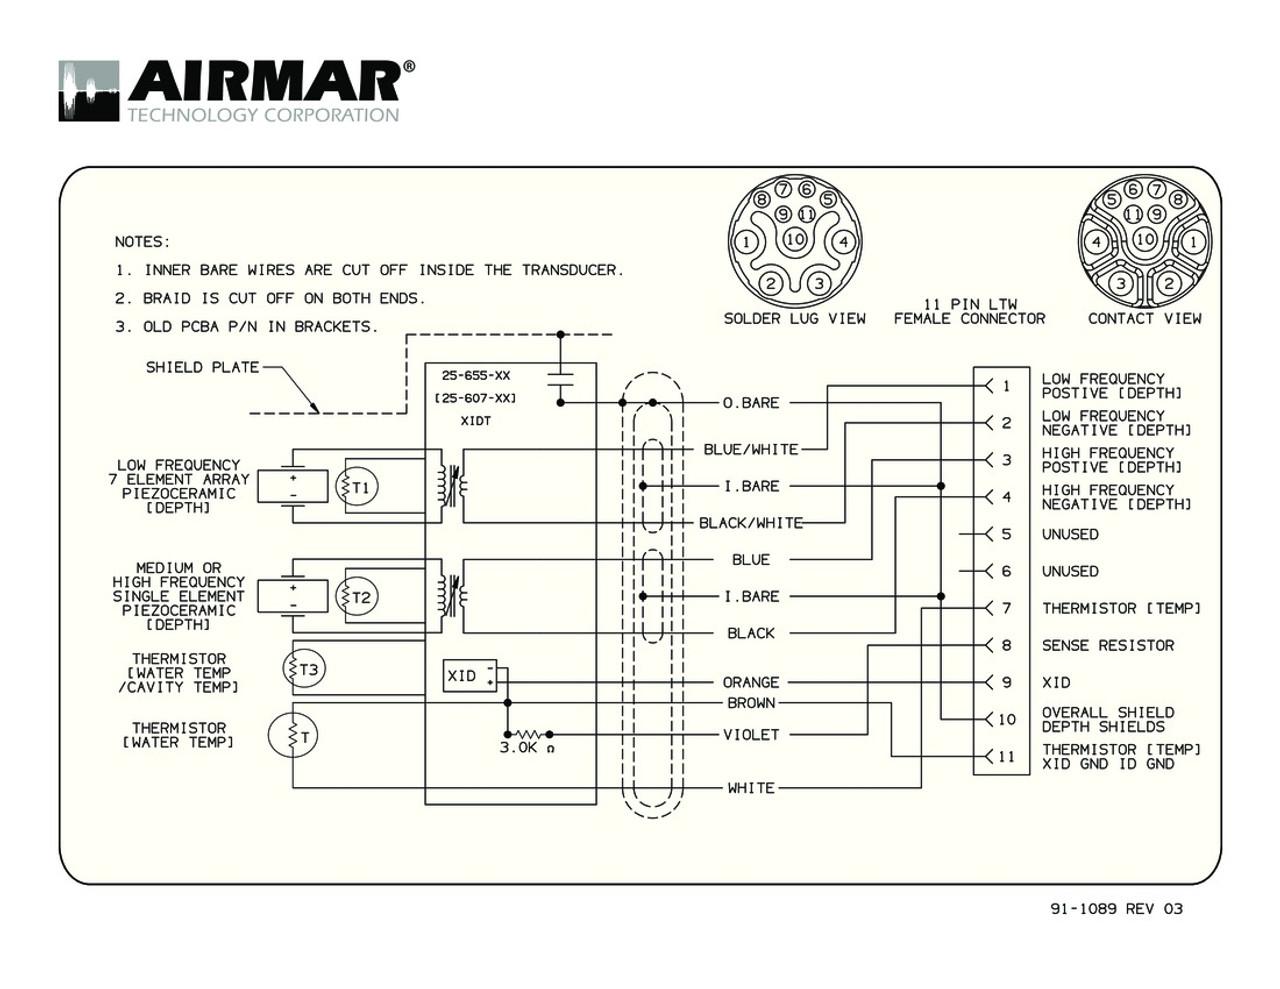 small resolution of  hubbell airmar wiring diagram tm265 blue bottle marine on pioneer wiring diagrams garmin wiring diagrams airmar wiring diagram raymarine